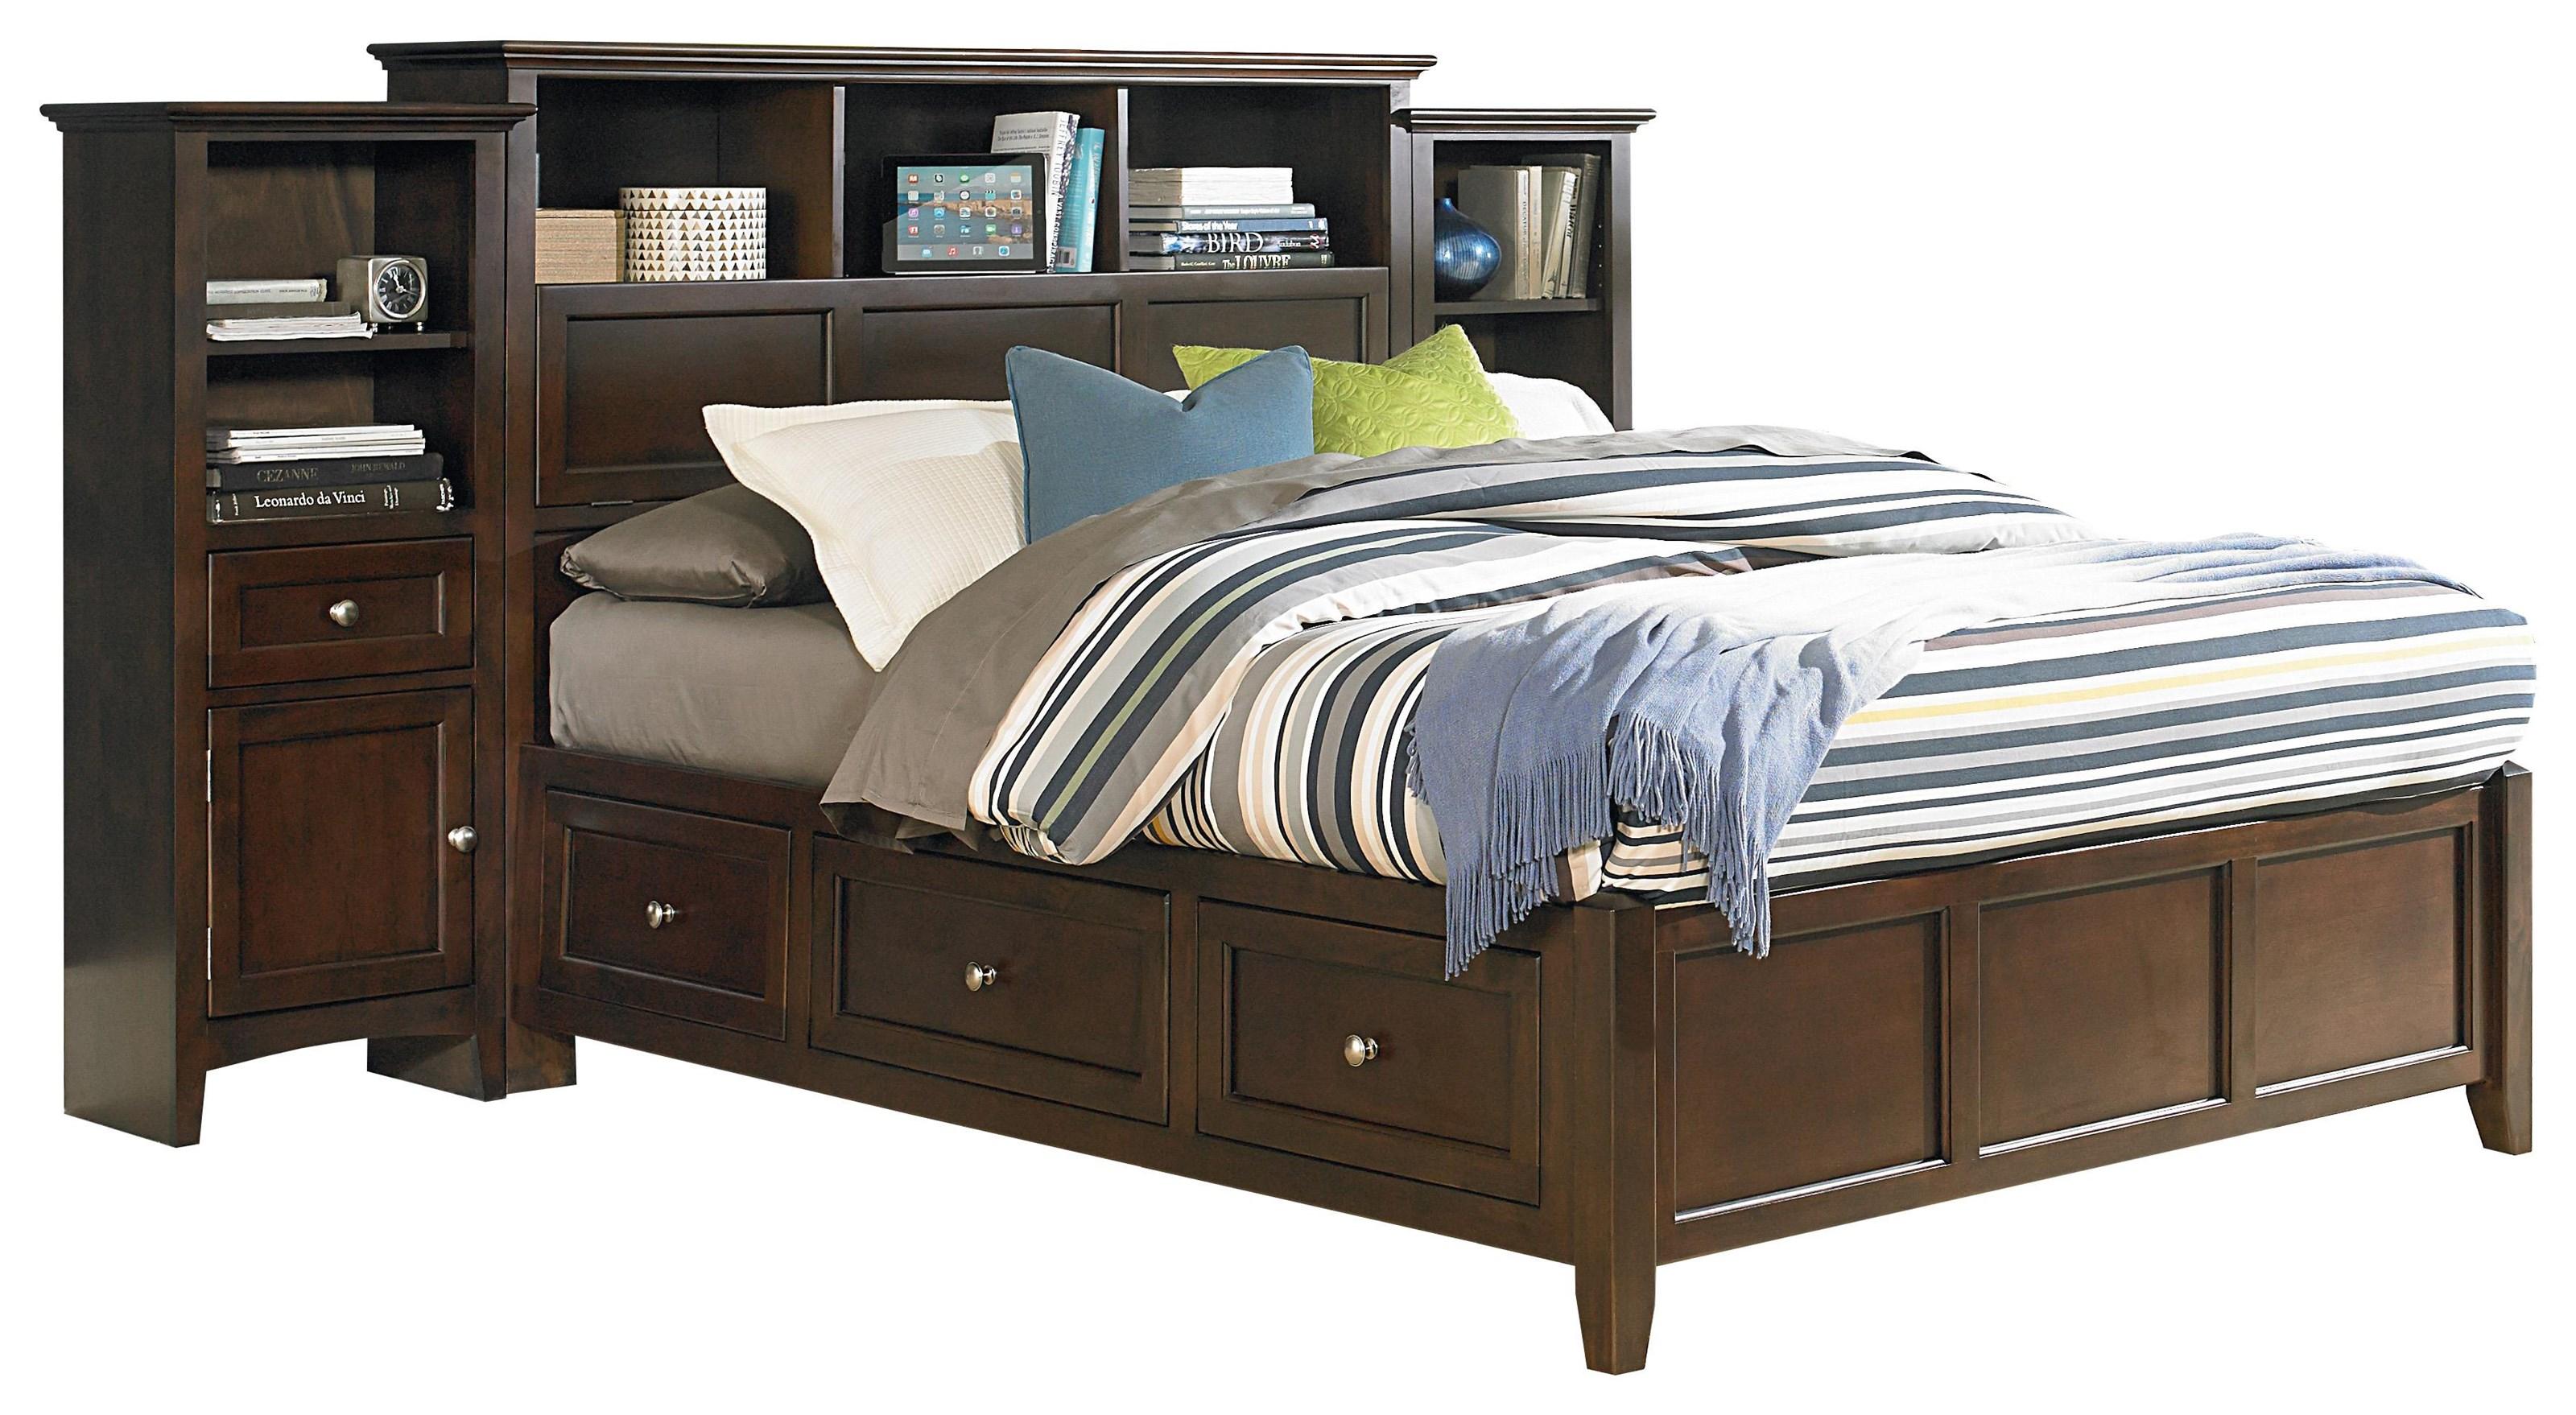 King Pedestal Bed Bookcase Headboard Piers Sadler S Home Furnishings Pier Beds